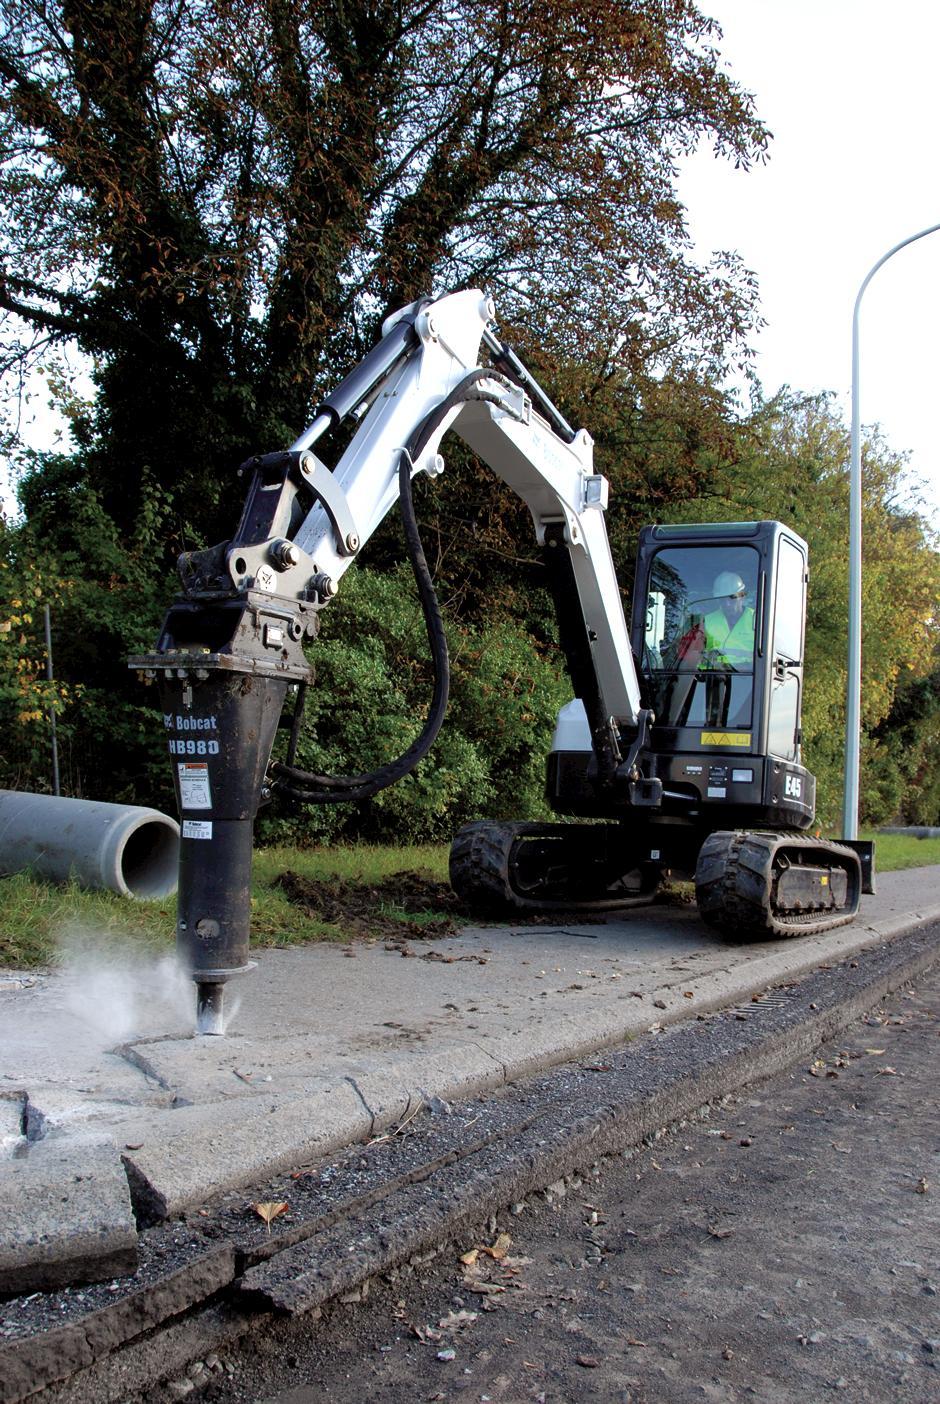 Bobcat E45 Compact Excavator Hire from TVE Hire & Sales